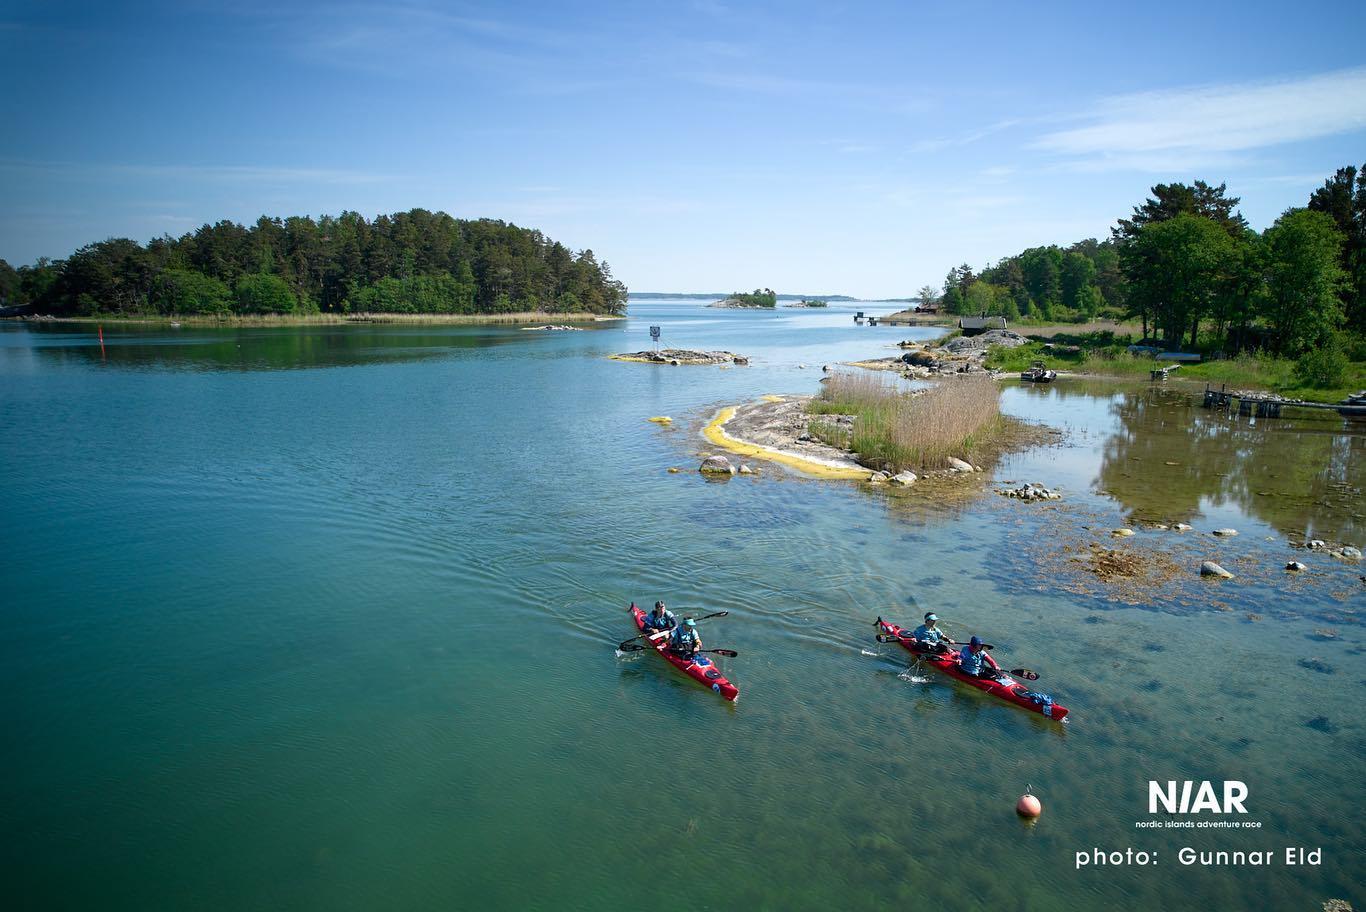 Kayaking in the Swedish Archipelago